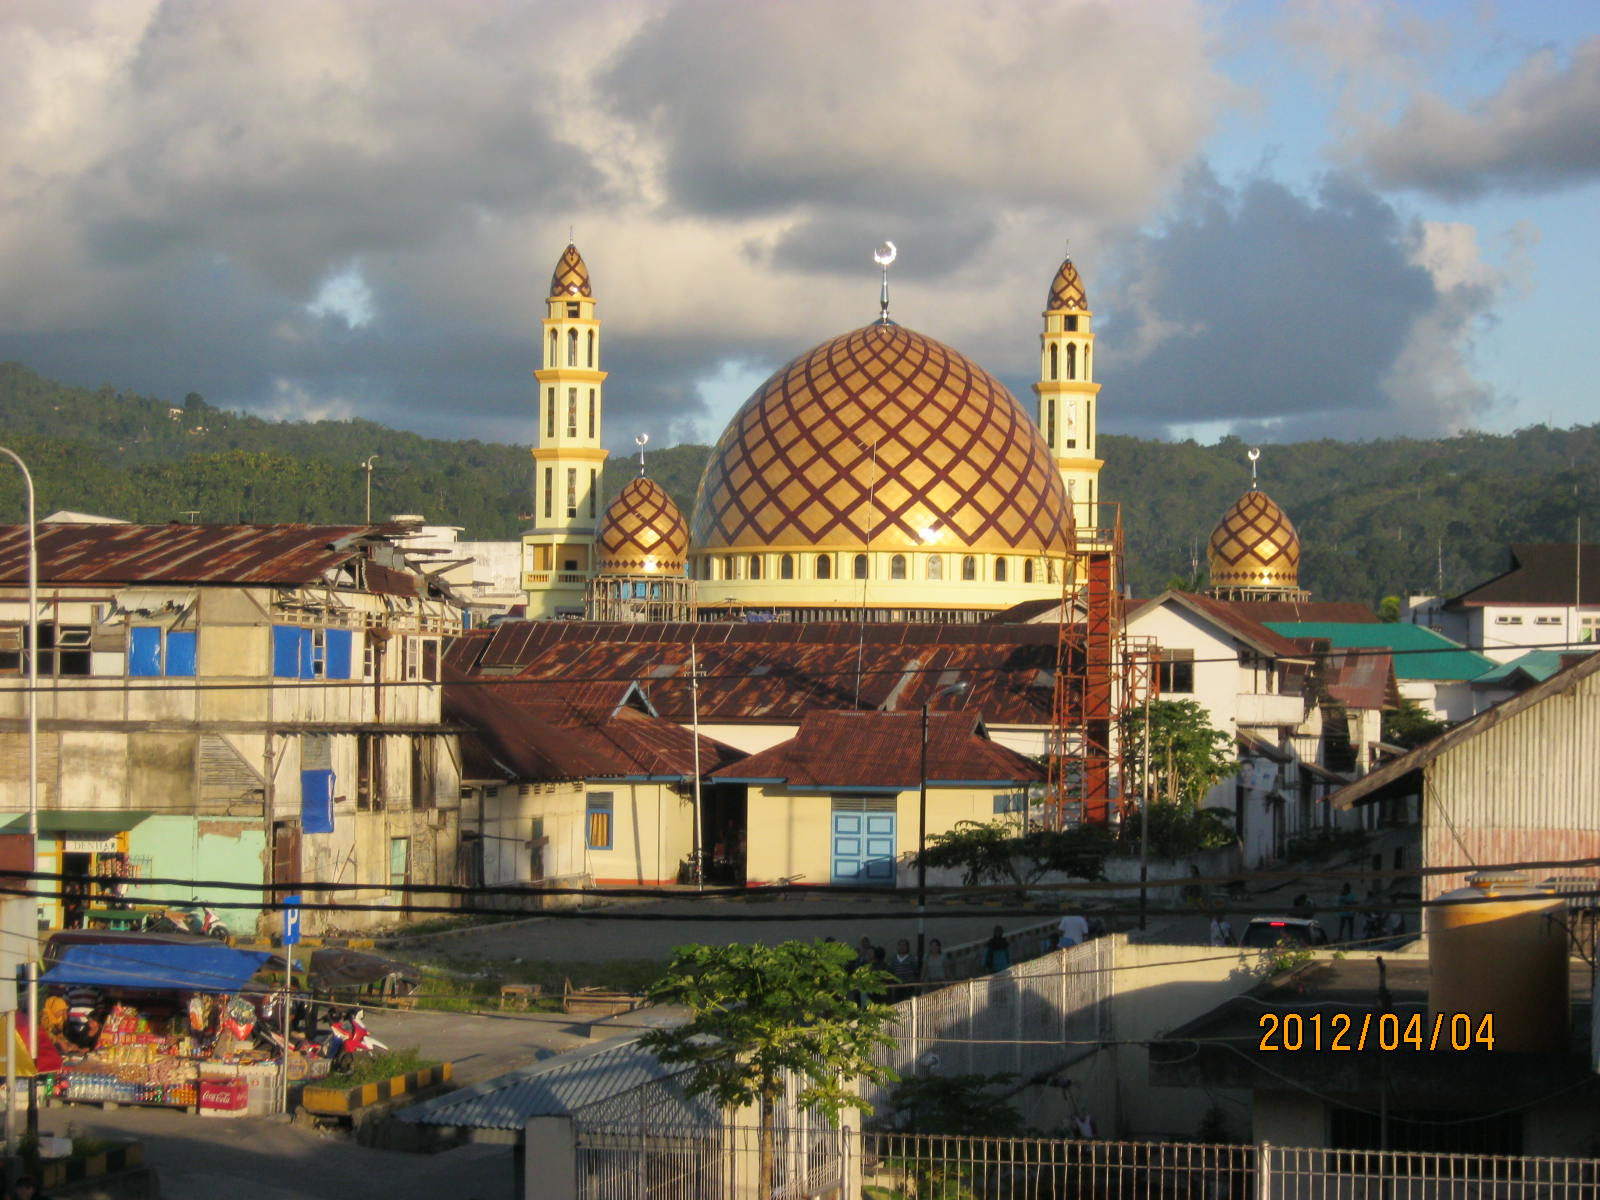 Zhen Blacklist Sejenak Banda Neira Mesjid Raya Al Fatah Masjid